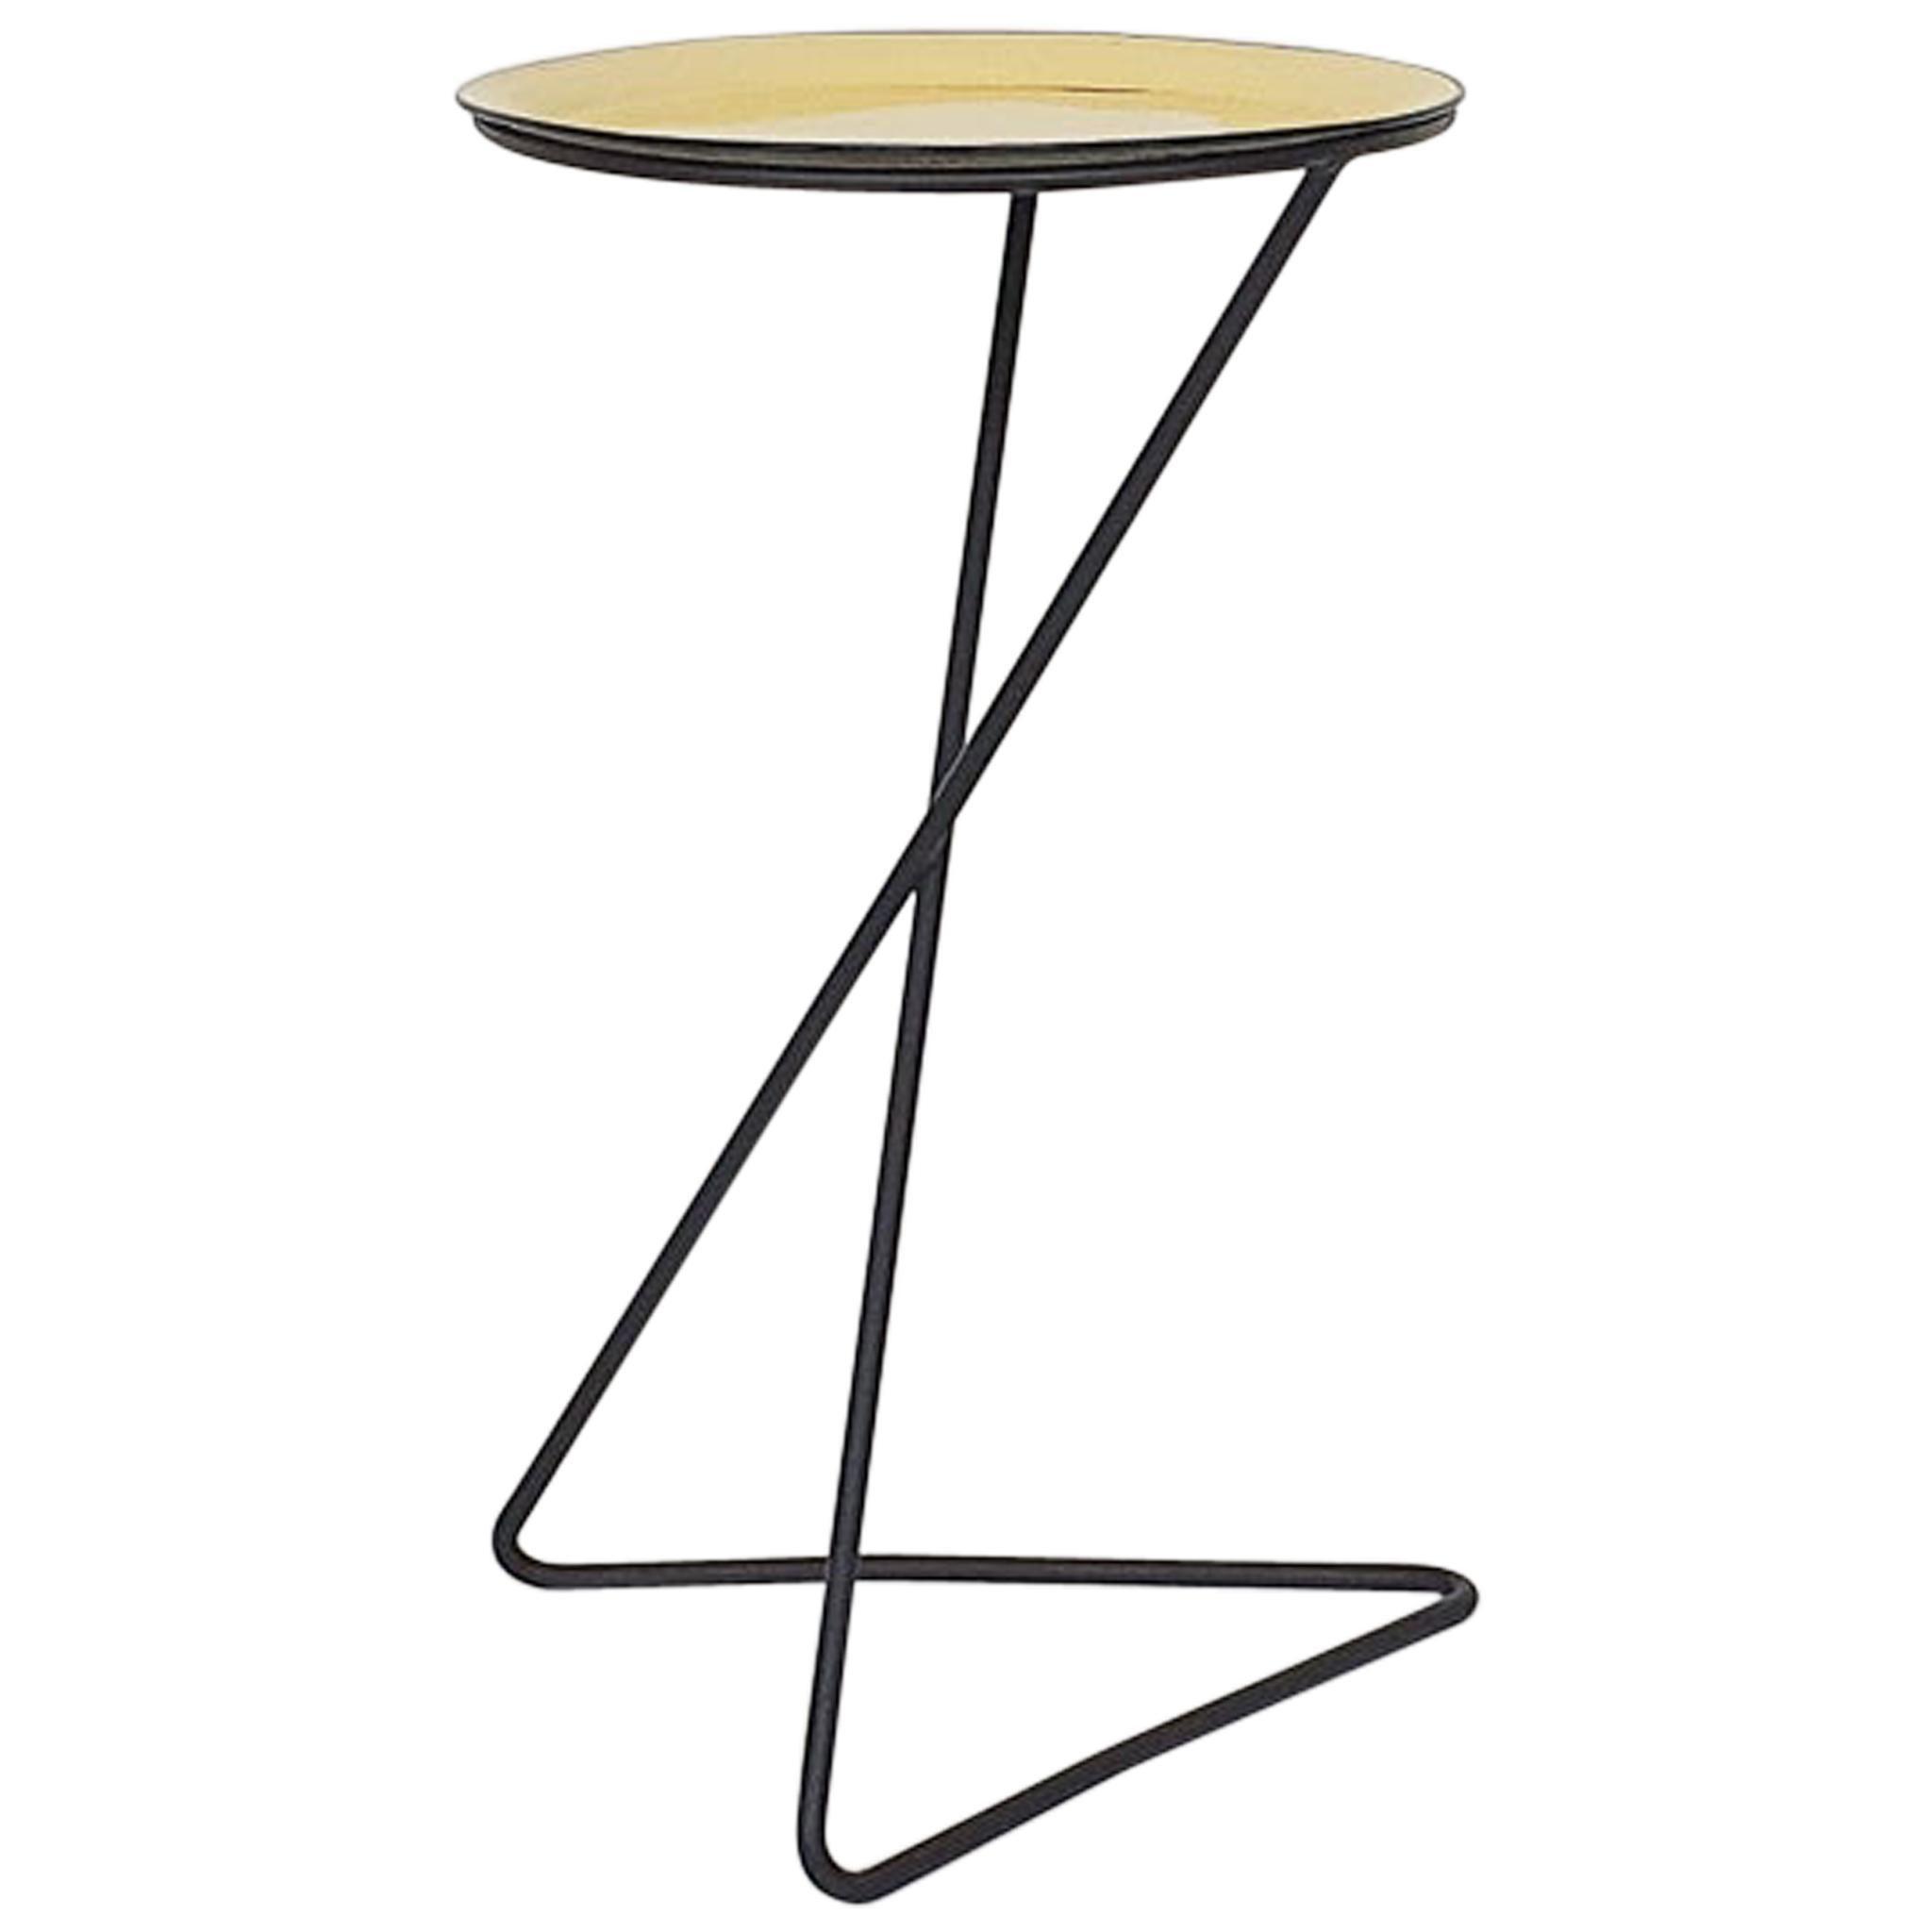 Minimalistic Metal Side Table, France 1950s